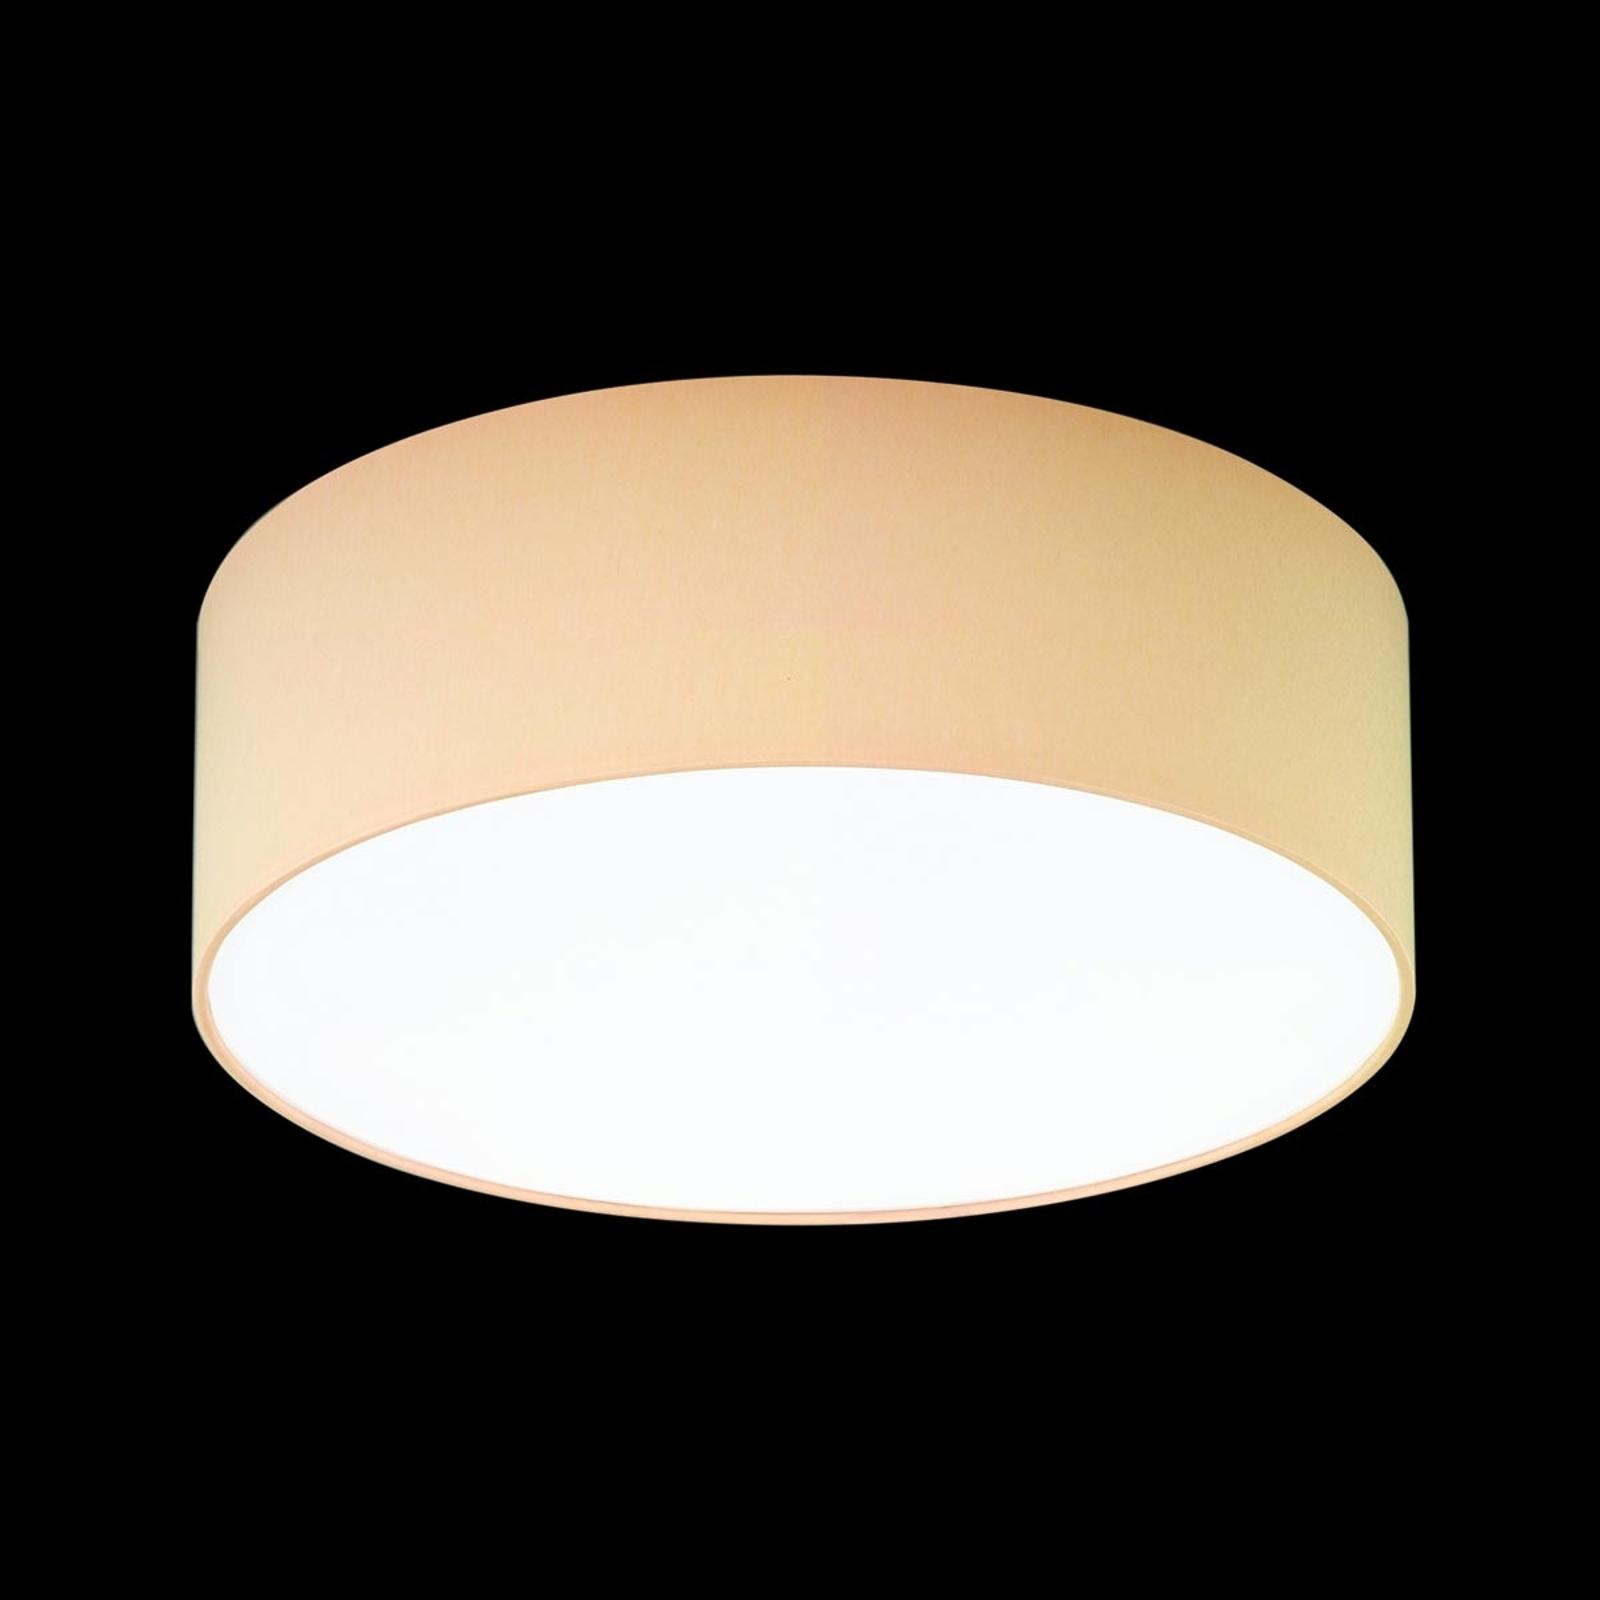 Szampańska lampa sufitowa MARA, 50 cm